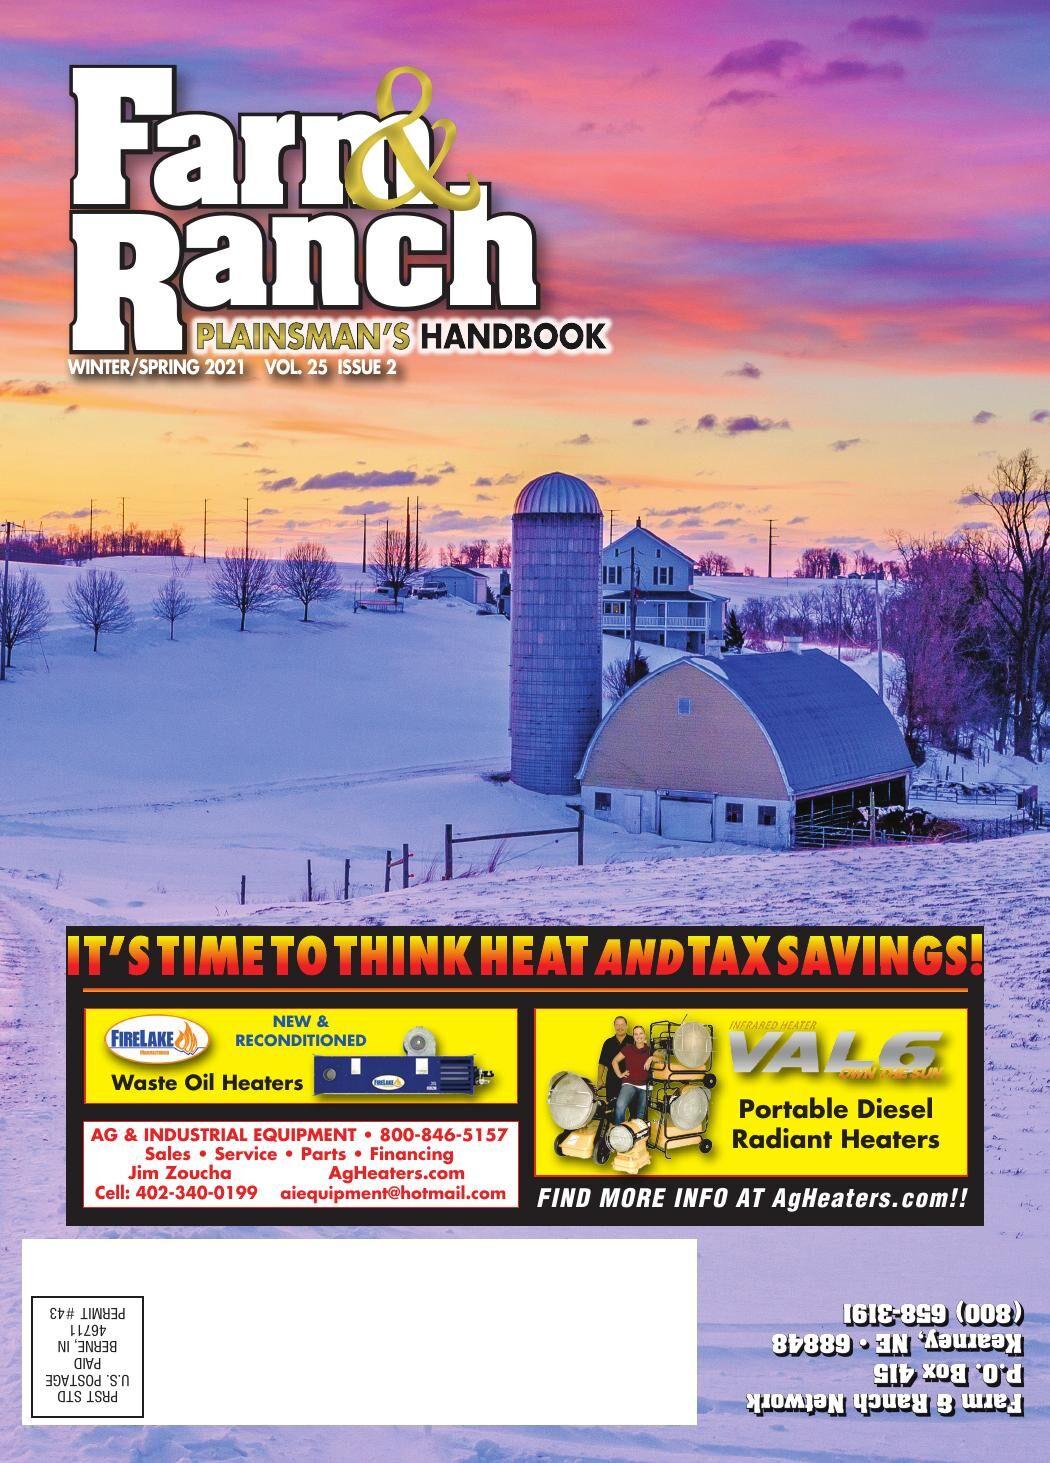 Plainsman's Handbook Winter/Spring 2021